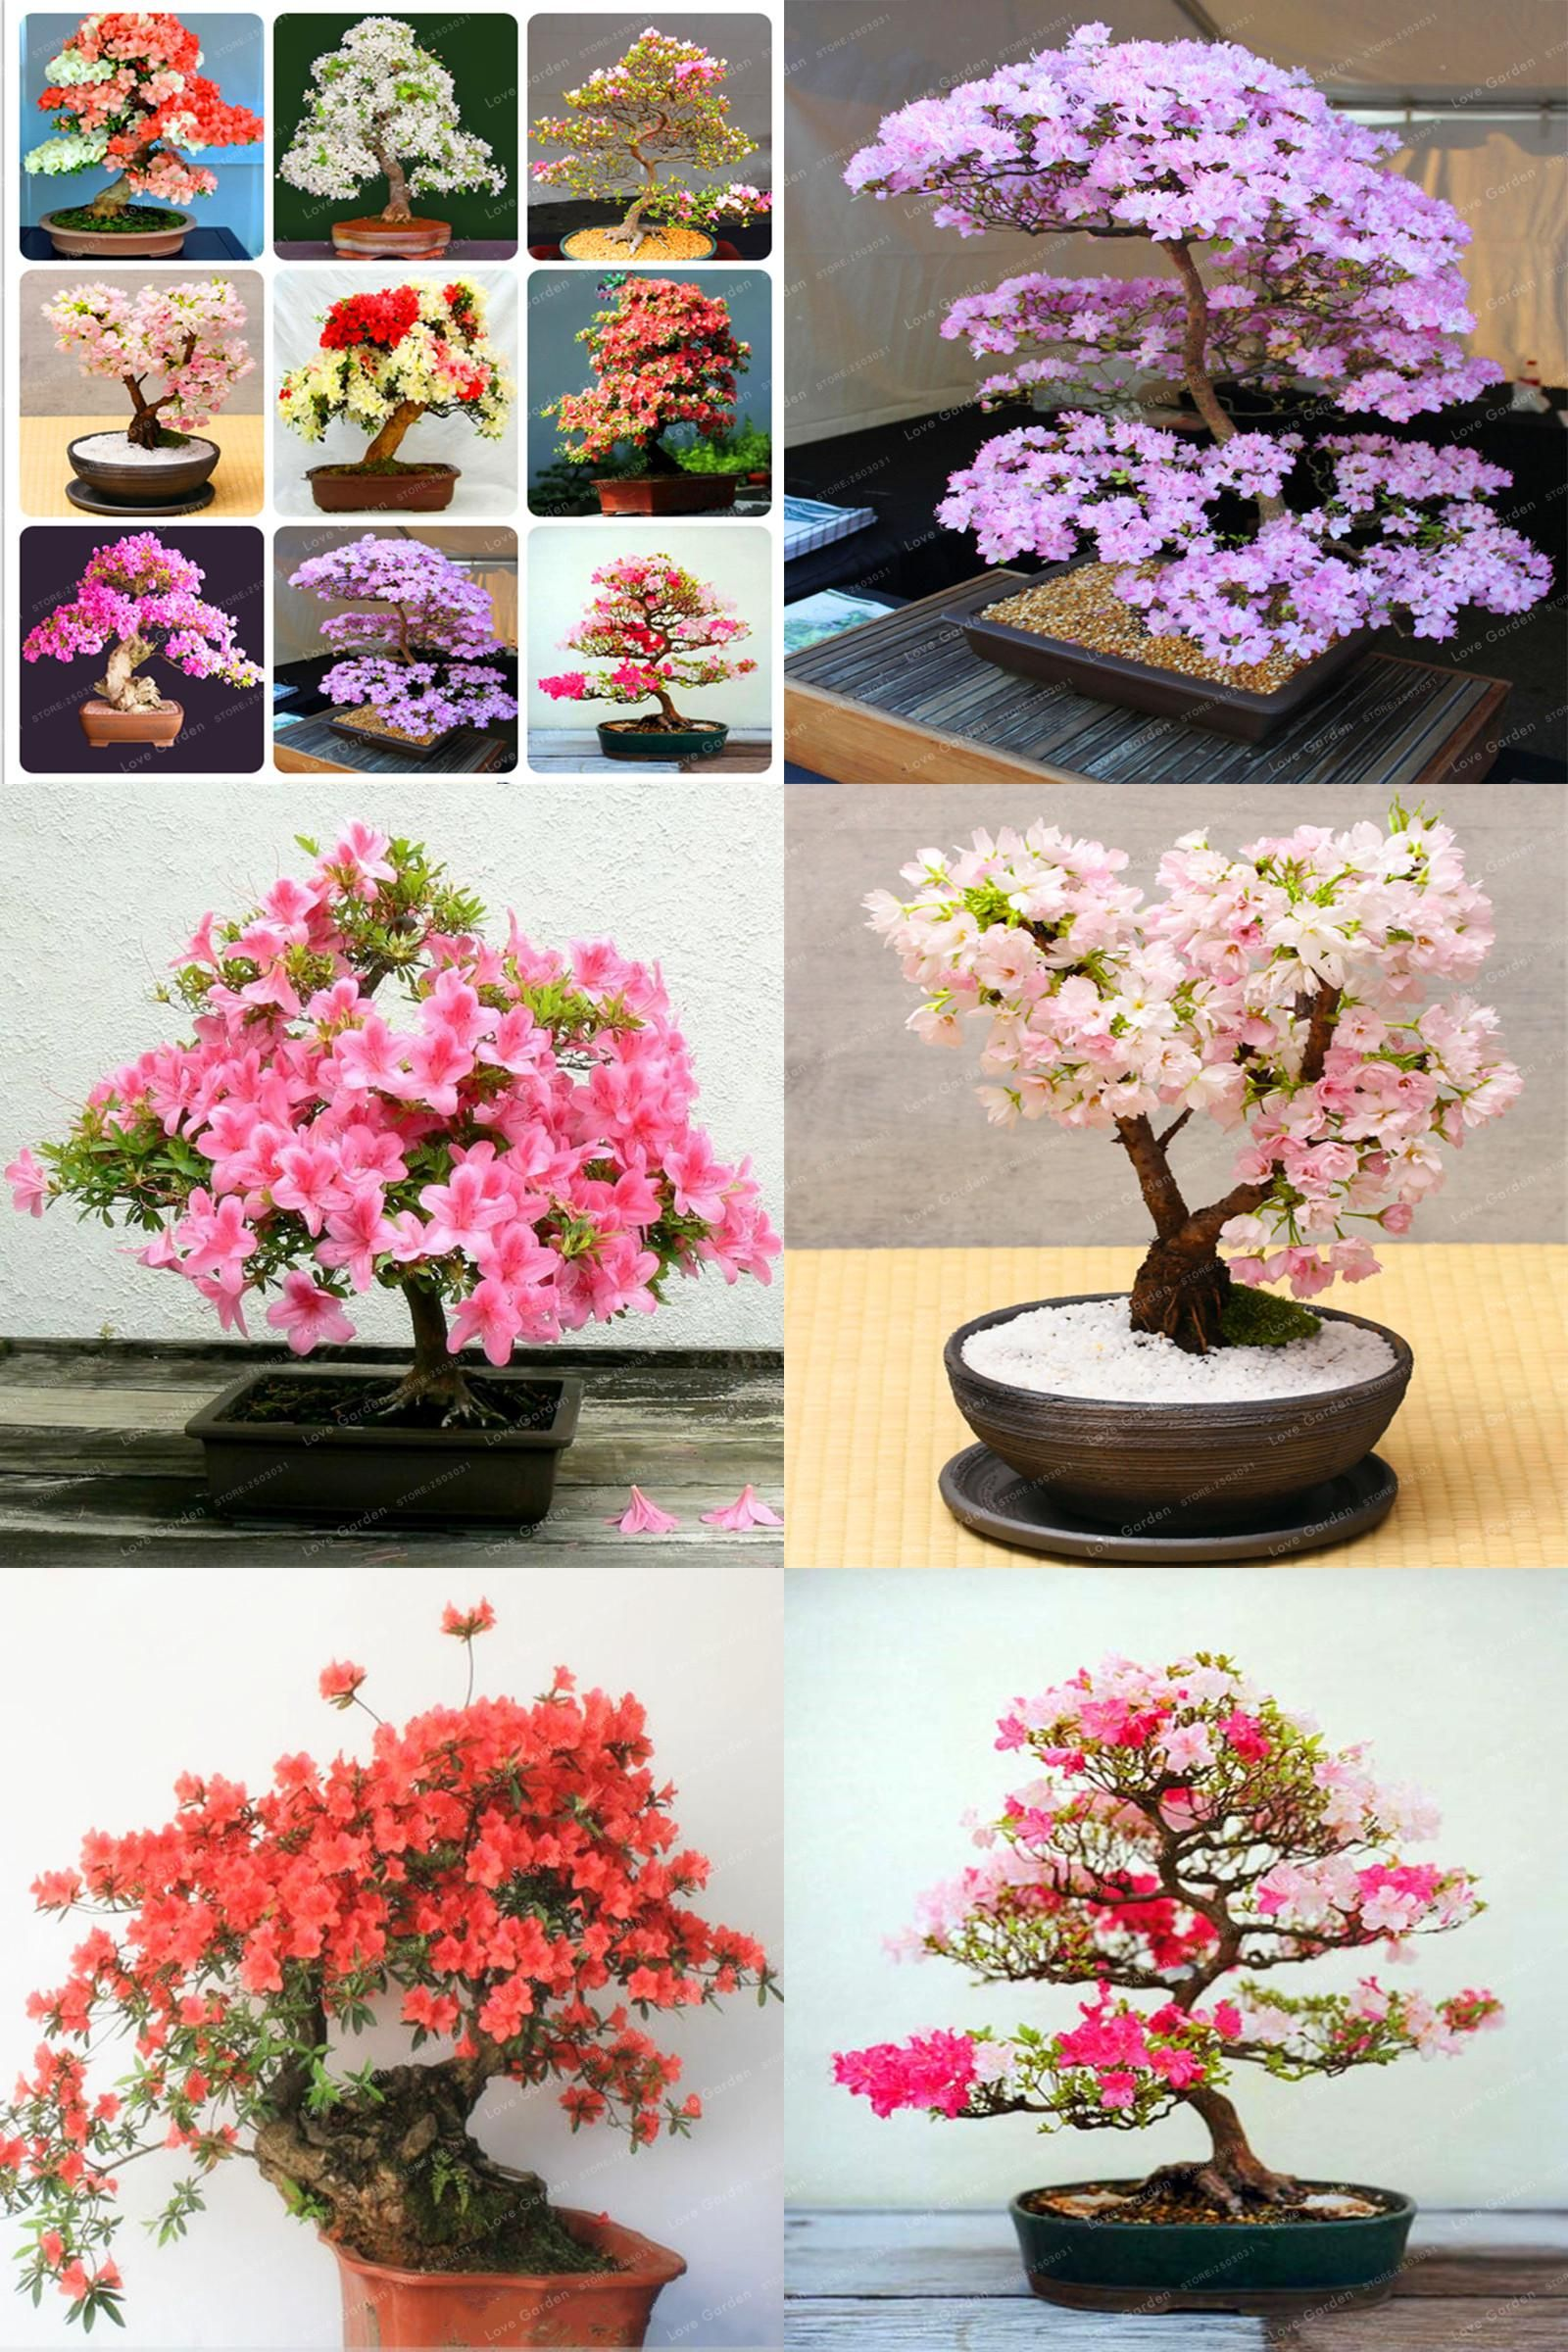 Visit To Buy Rare Sakura Seeds Bonsai Flower Cherry Blossoms Tree Cherry Blossom Seeds Bonsai Plants For Home Bonsai Flower Cherry Blossom Tree Bonsai Plants